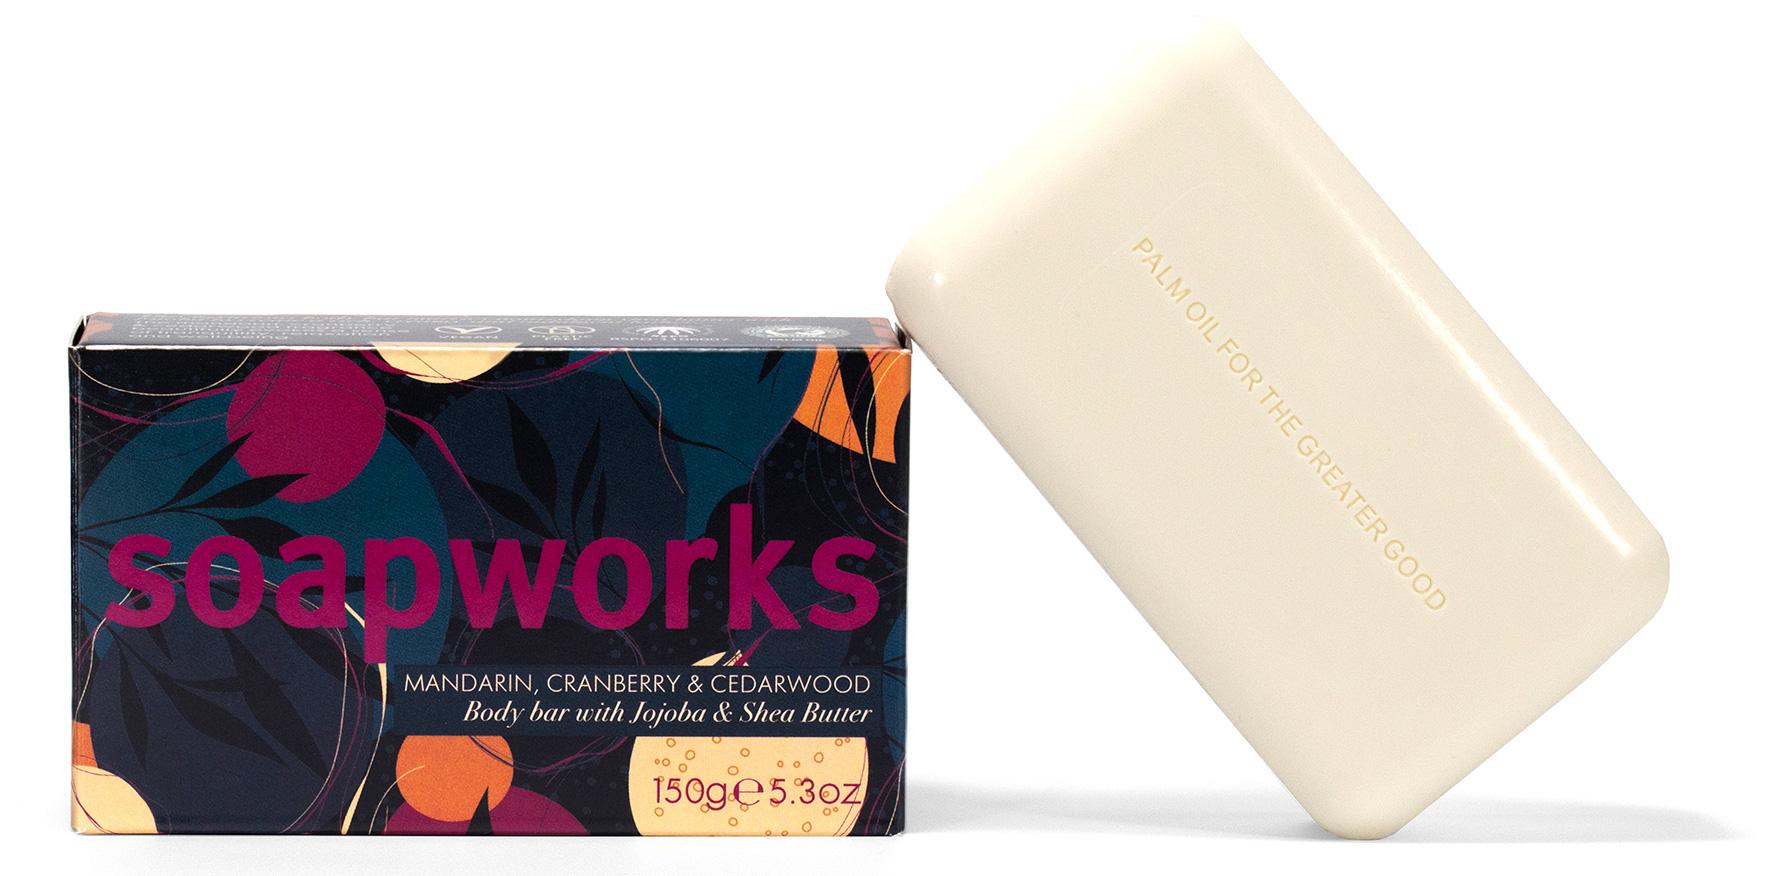 Soapworks Mandarin Cranberry and Cedarwood Soap single shot